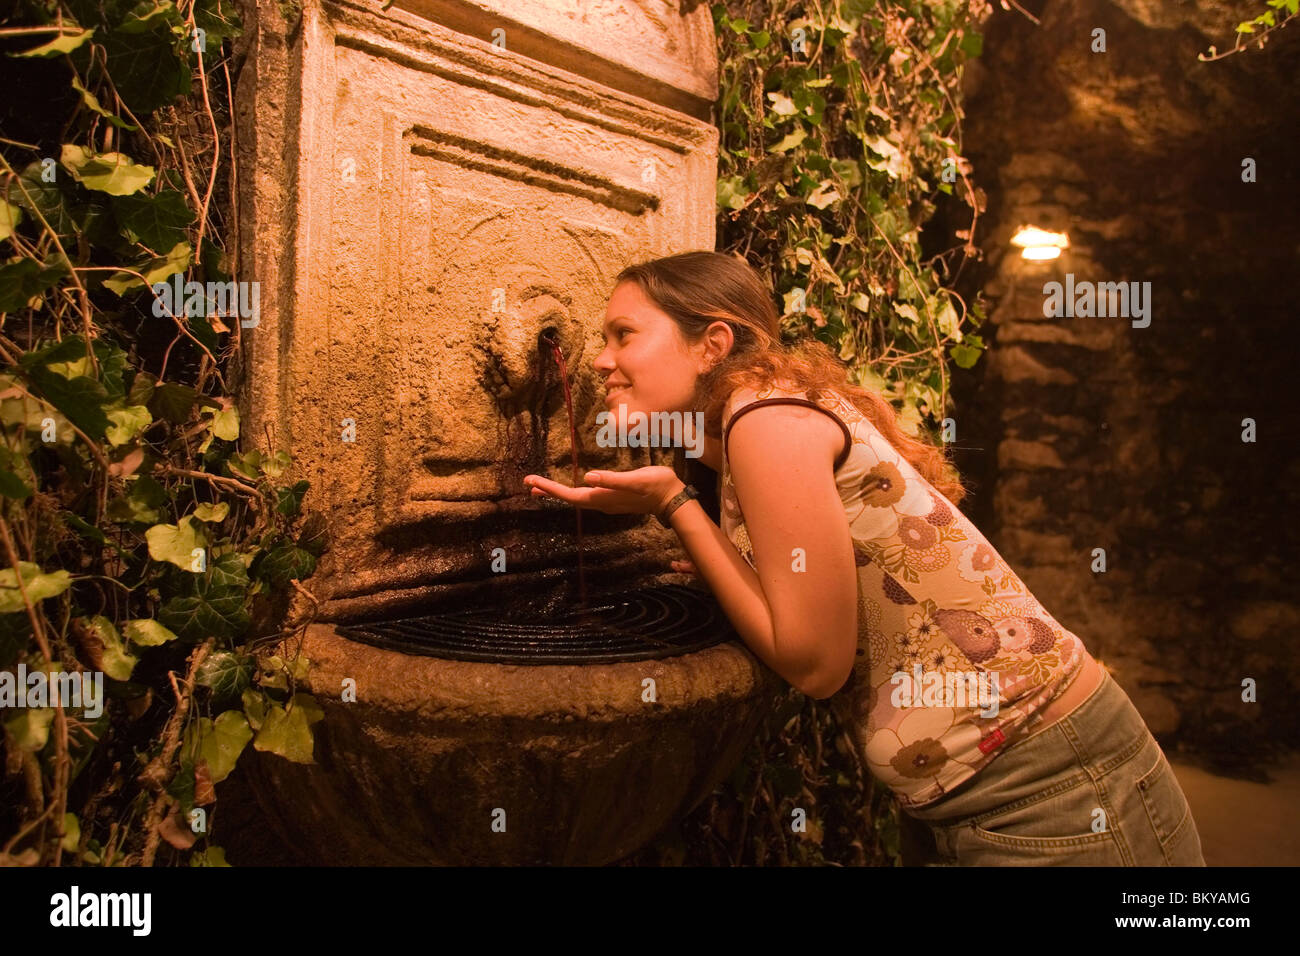 Woman at wine fountain in Buda Castle Labyrinth, Woman tasting red wine of the wine fountain in Buda Castle Labyrinth, Stock Photo